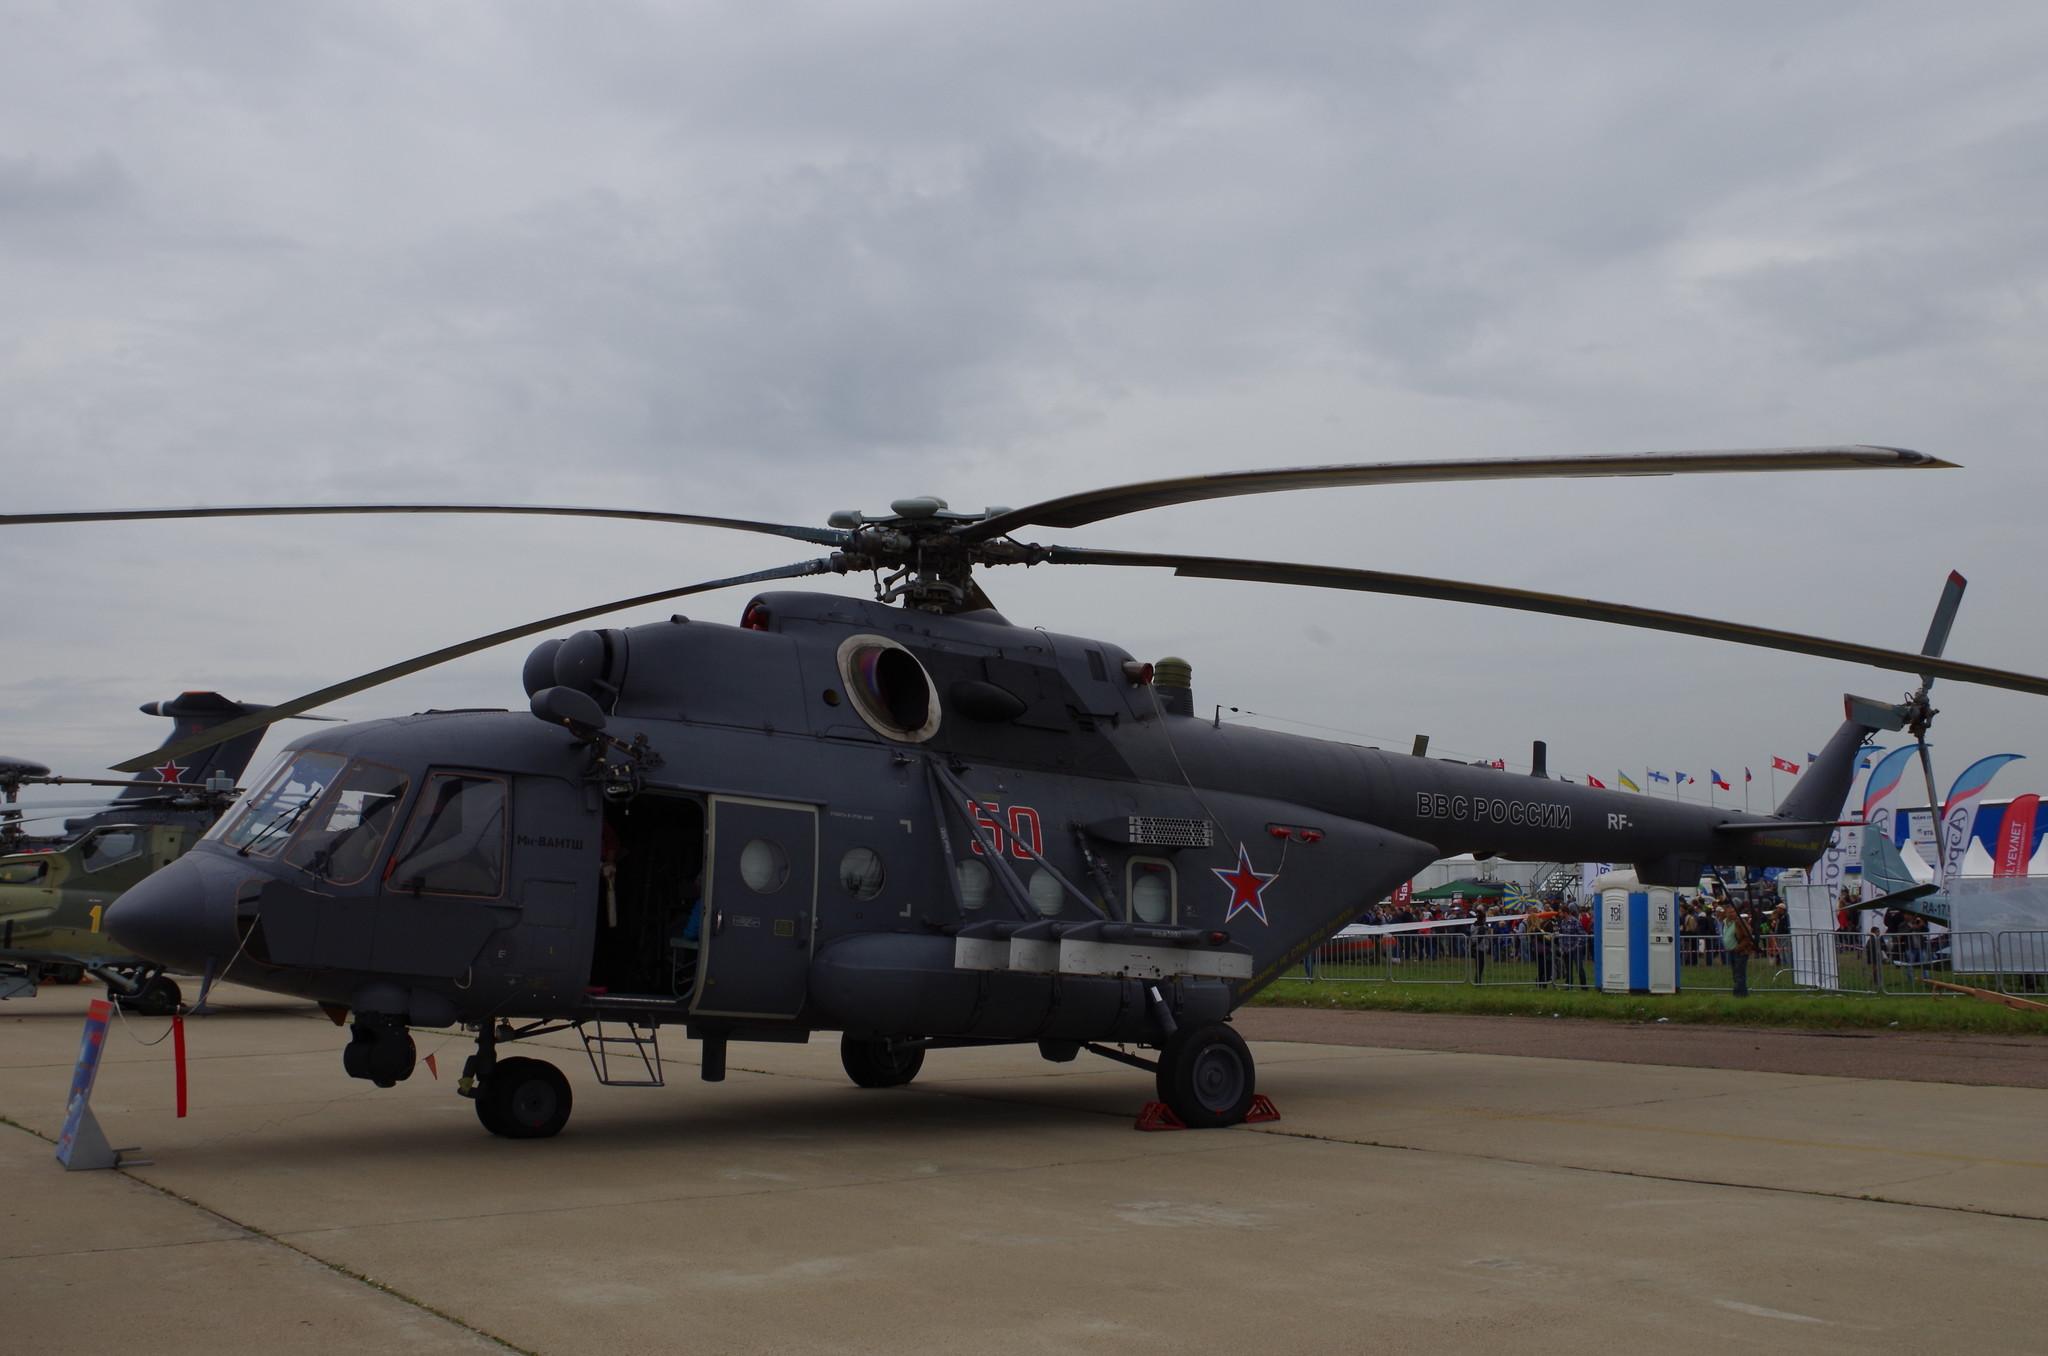 Ми-8АМТШ - транспортно-штурмовой вертолёт